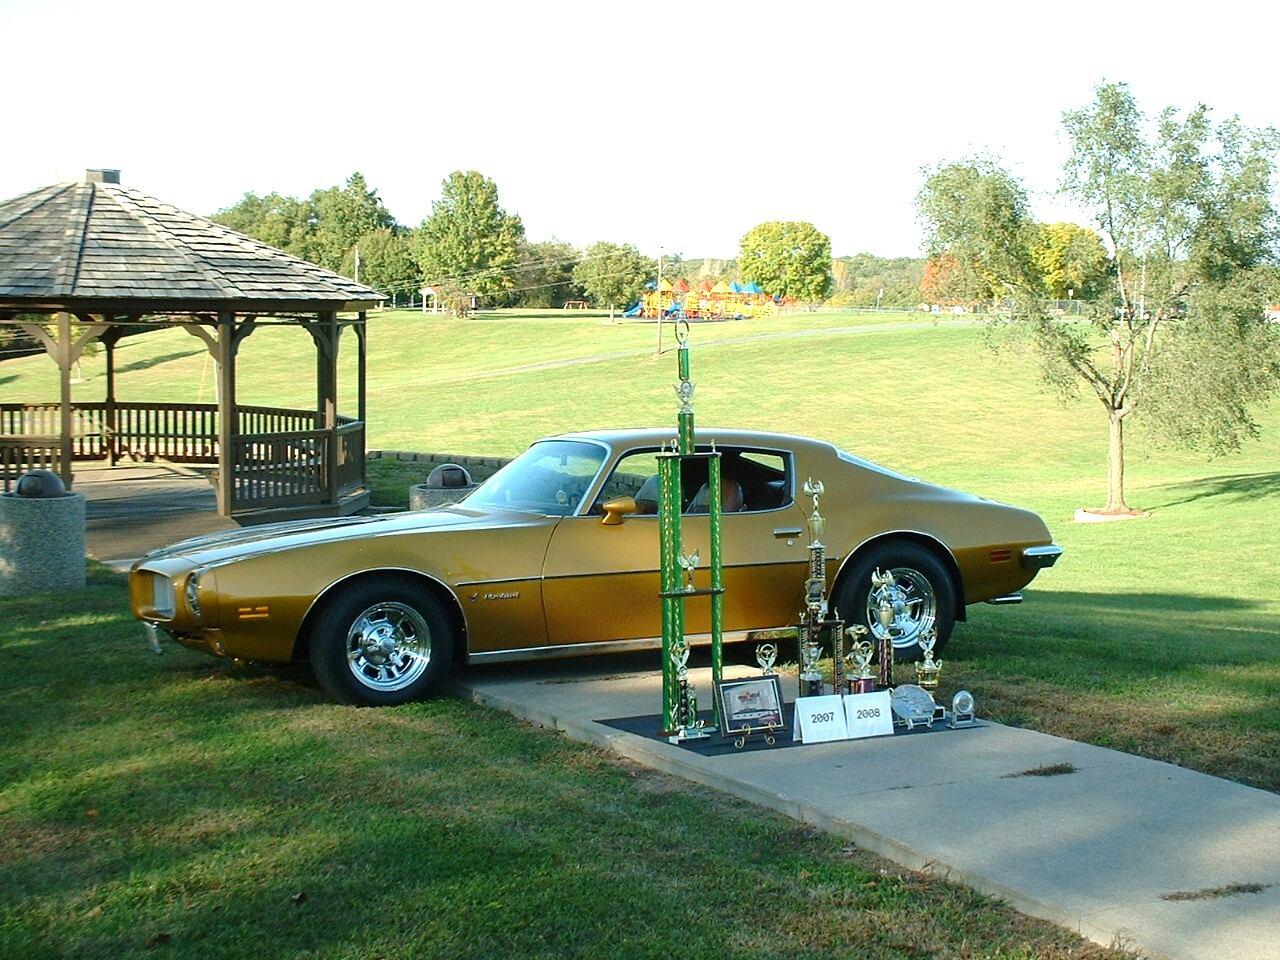 1973 - Pontiac, Firebird Esprit